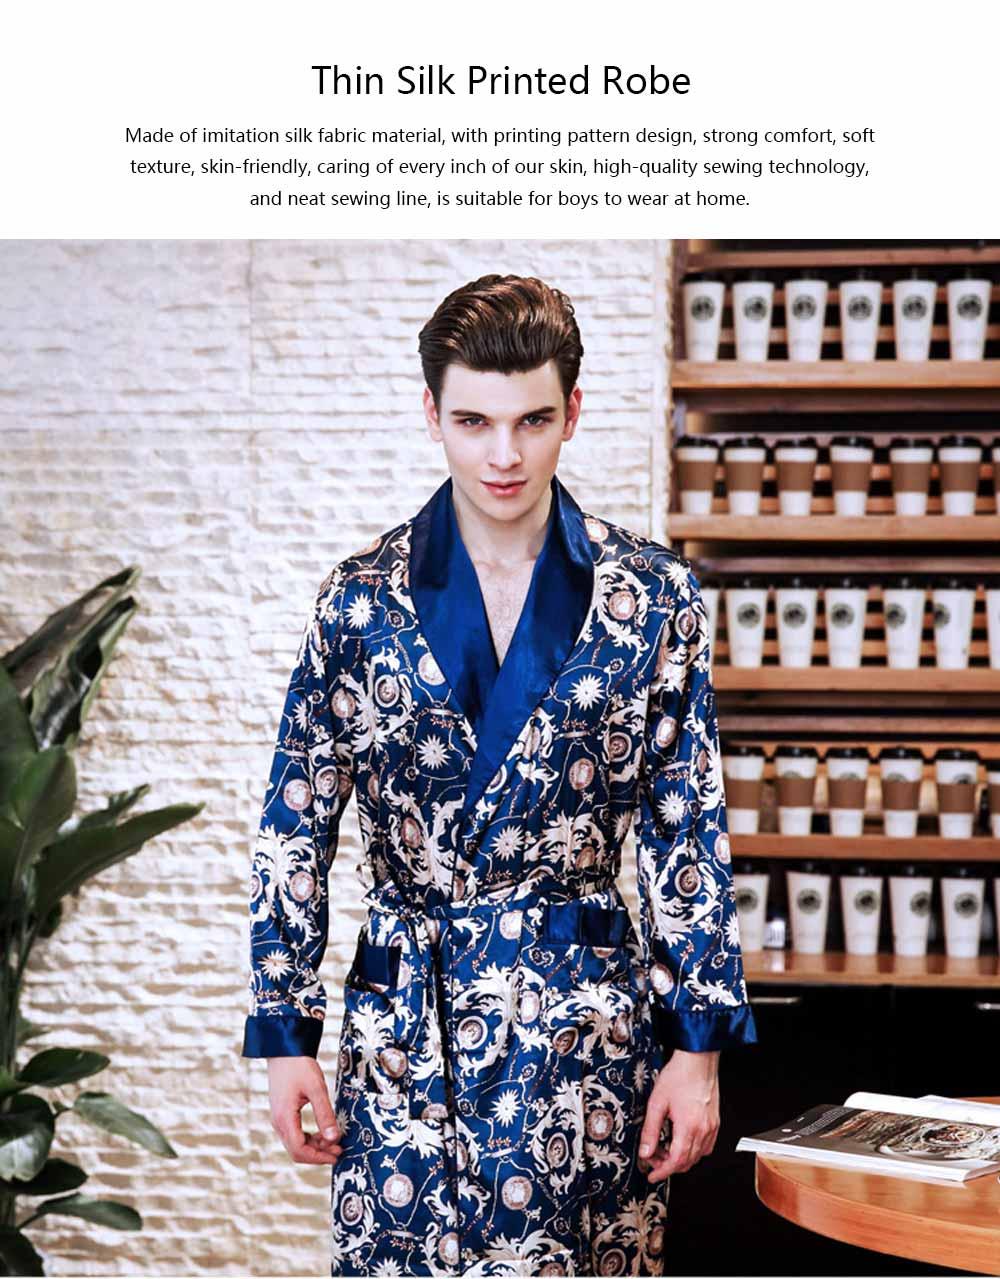 Men's Classic Lapel Shorts and Long Sleeve Pajamas, Thin Imitation Silk Fabric Classic Lapel Printed Robe 0